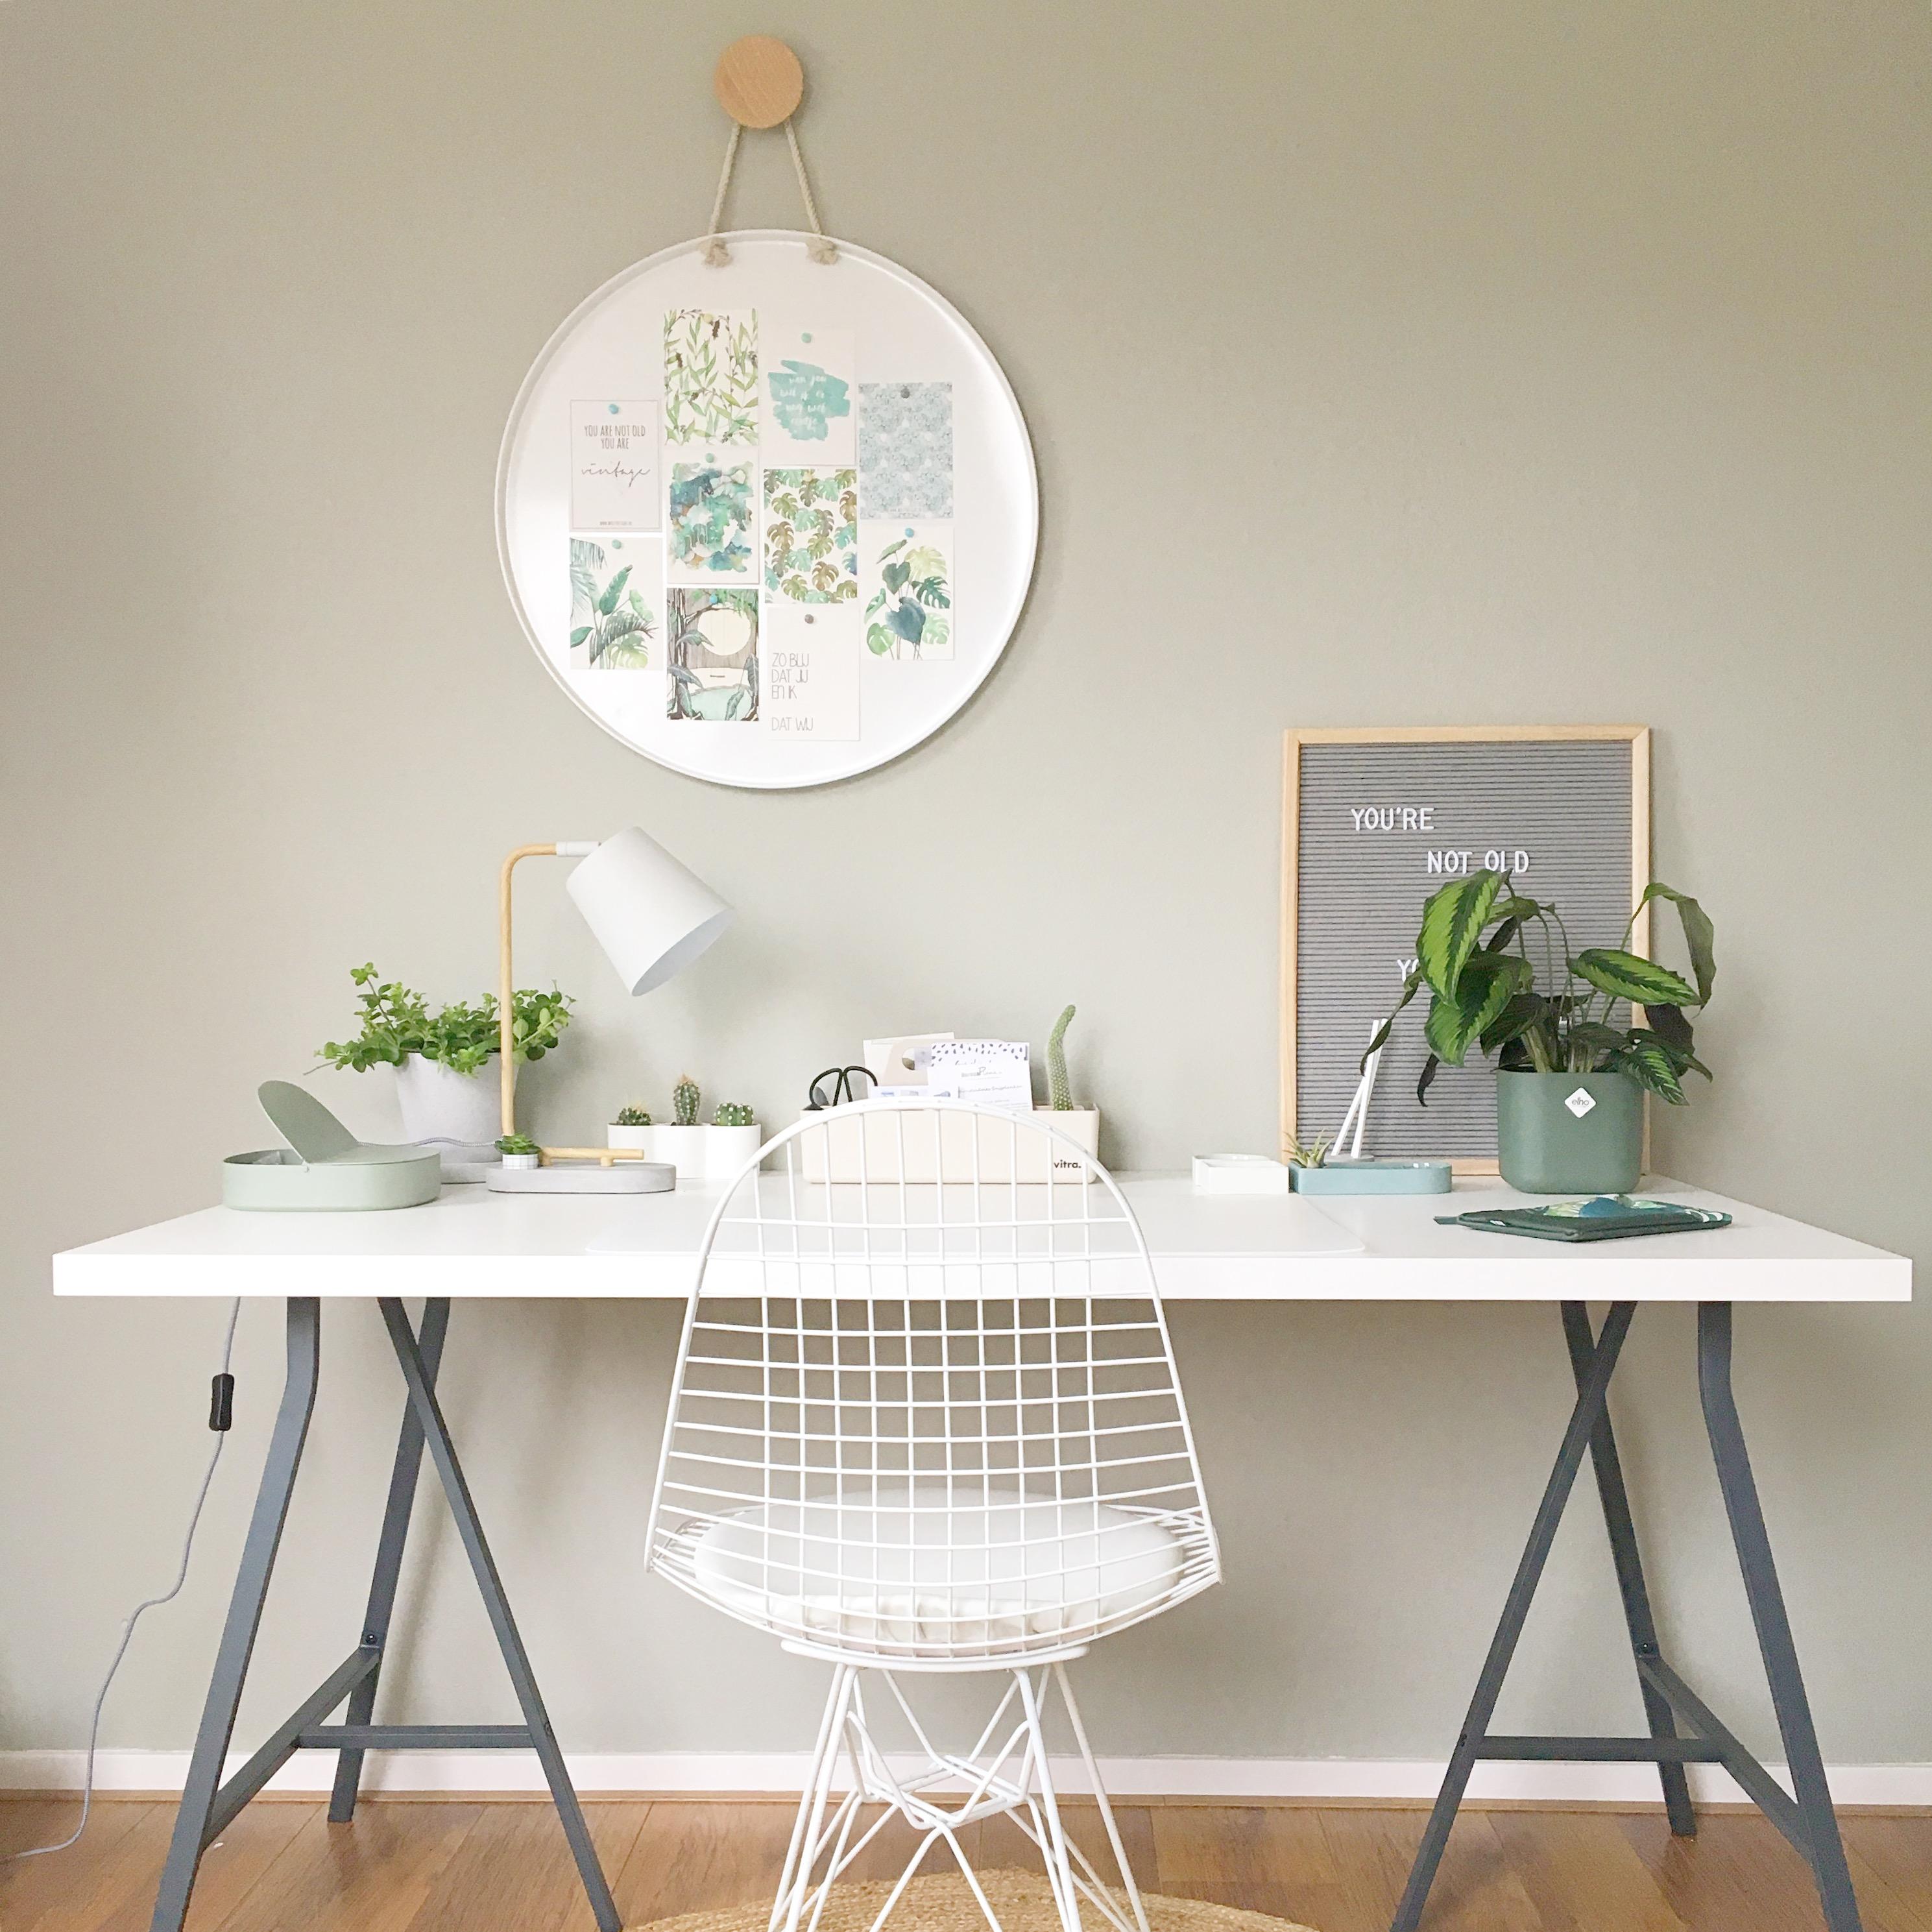 werkkamer hobbykamer draadstoel magneetbord